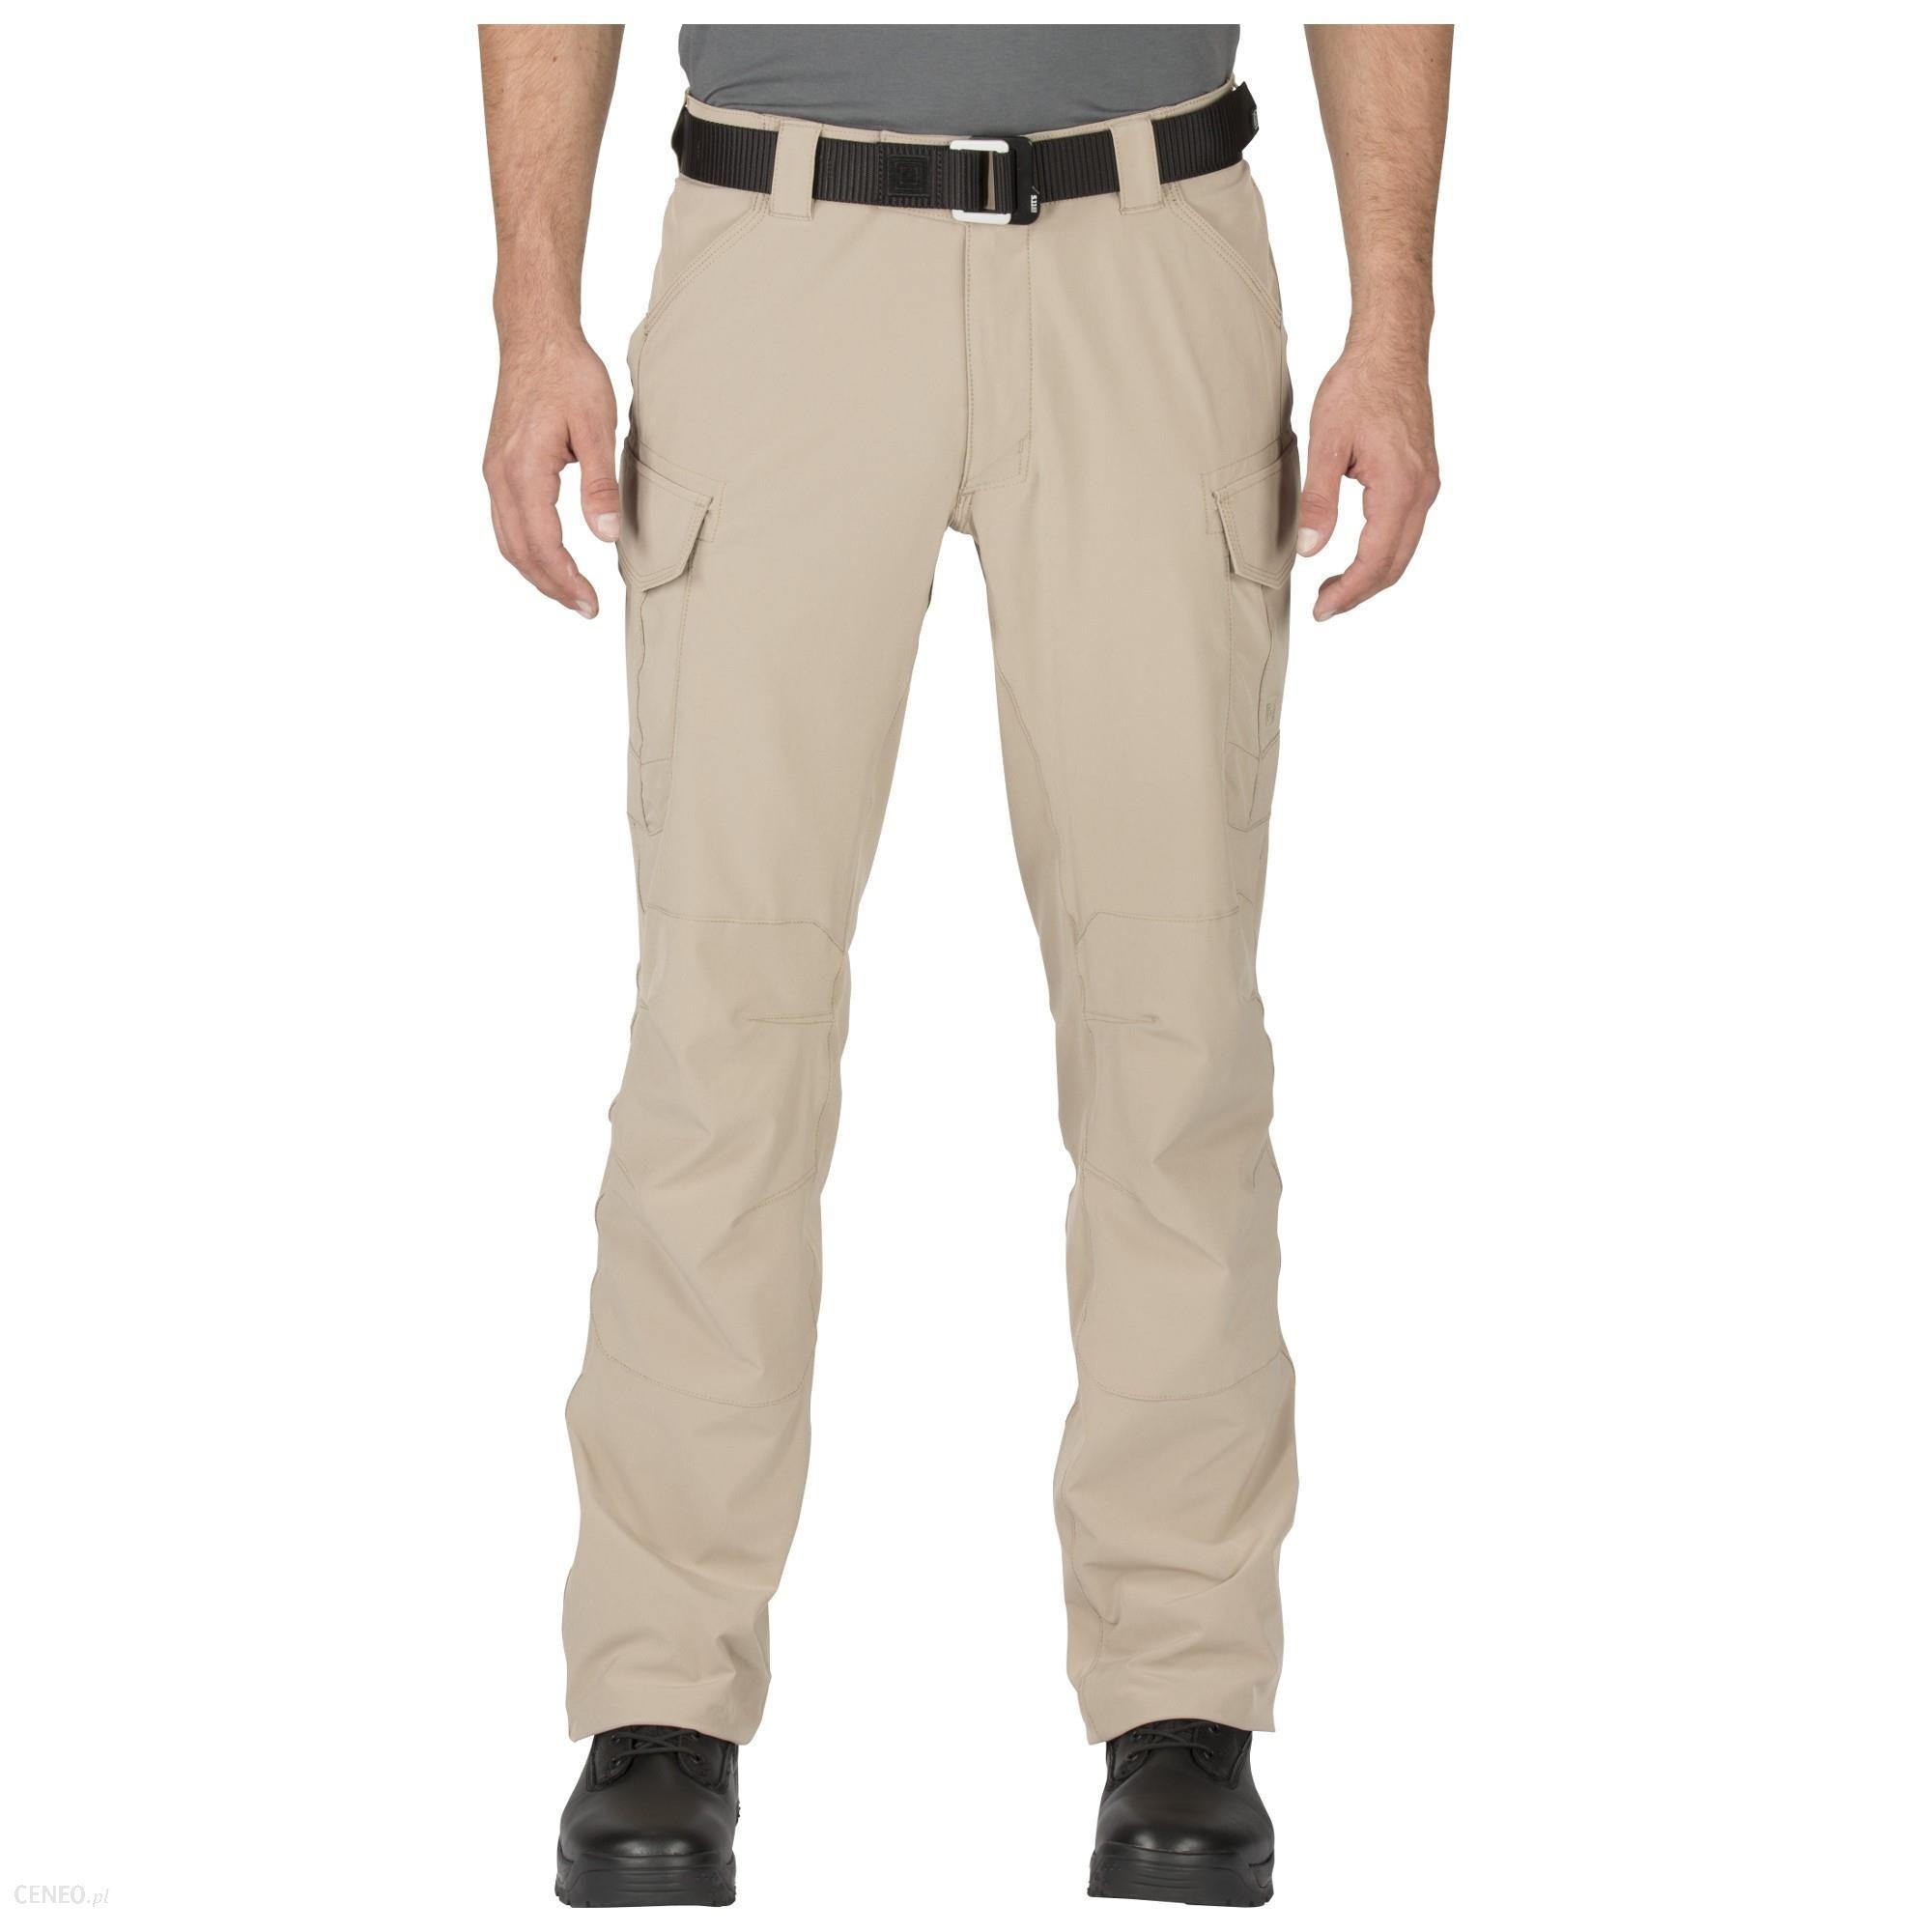 5.11 Tactical Spodnie Traverse Pant 2.0 Khaki (74438-055)